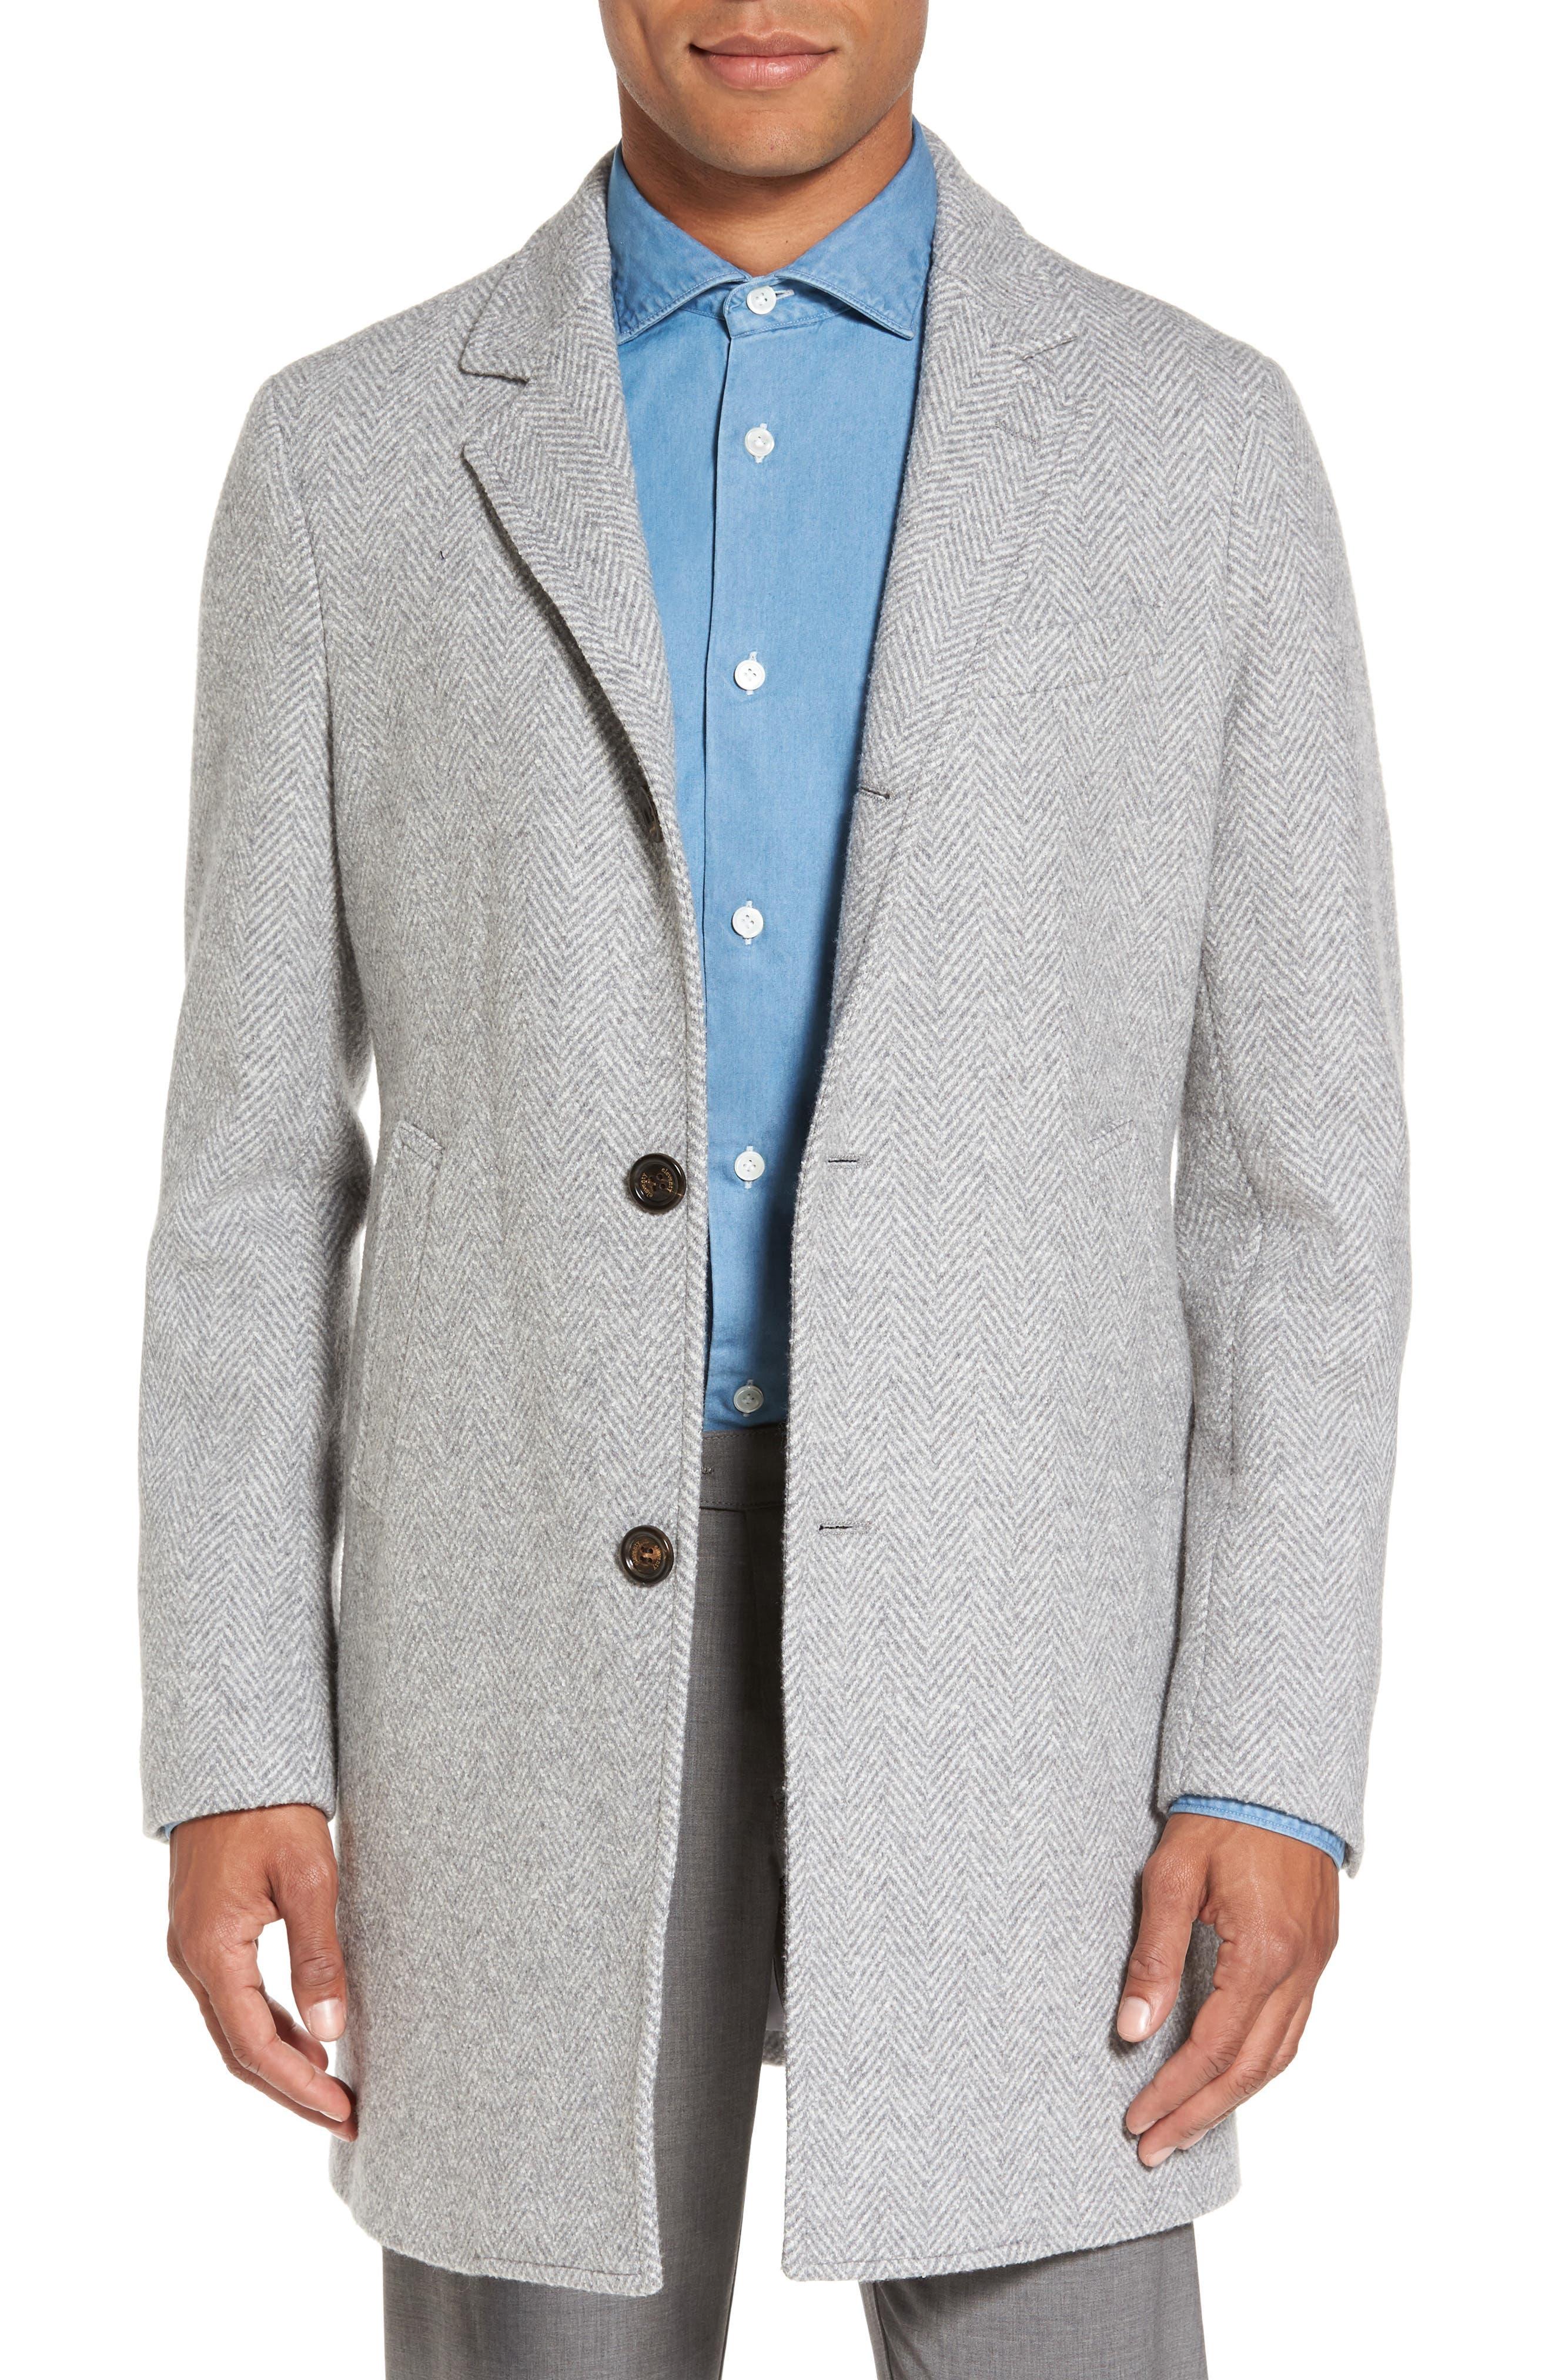 Herringbone Wool Blend Overcoat,                             Main thumbnail 1, color,